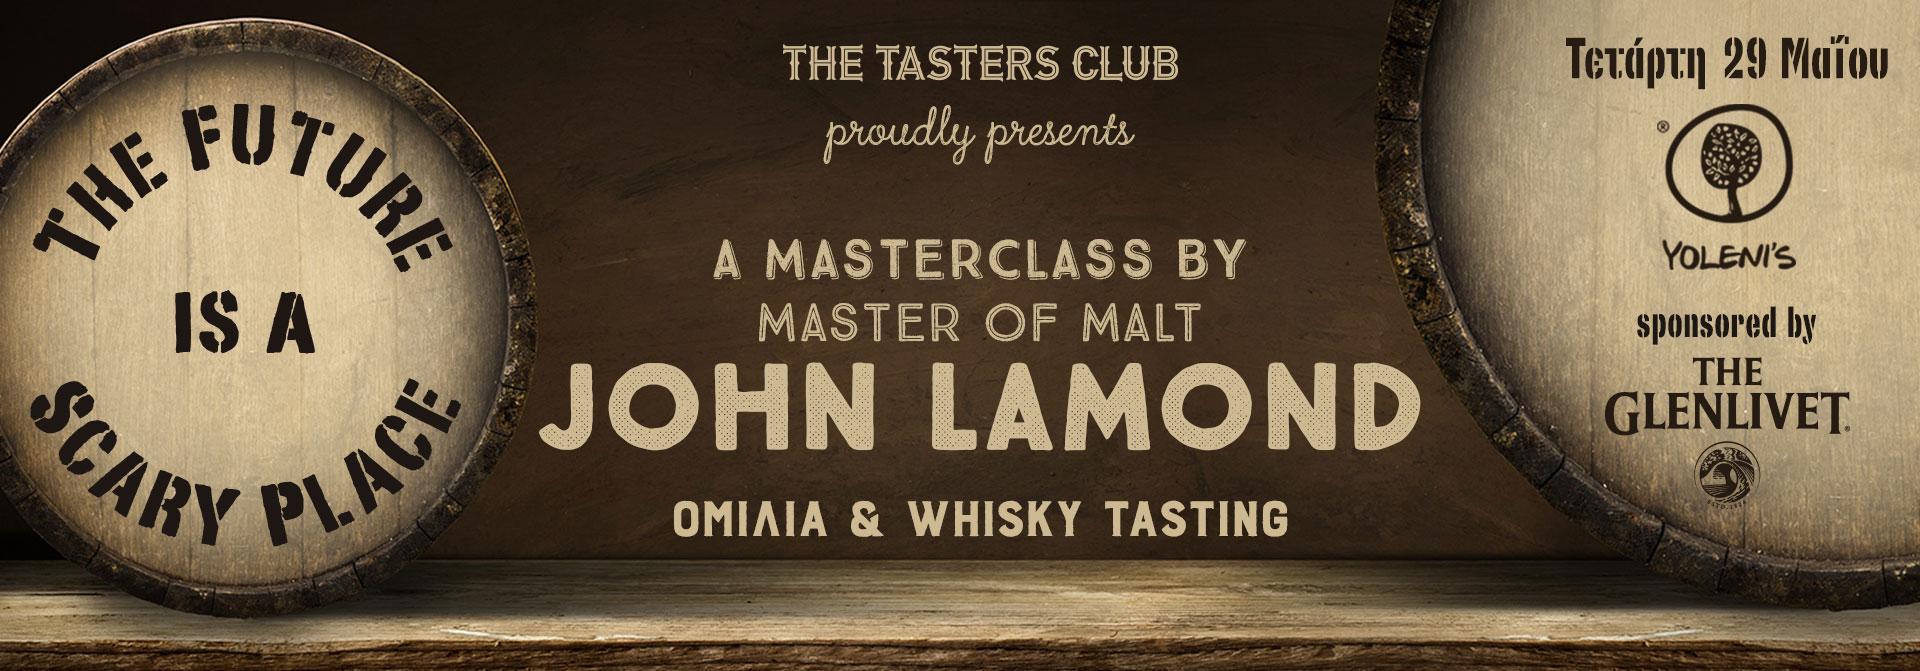 John Lamond masterclass yolenis Athens 2019 the tasters club